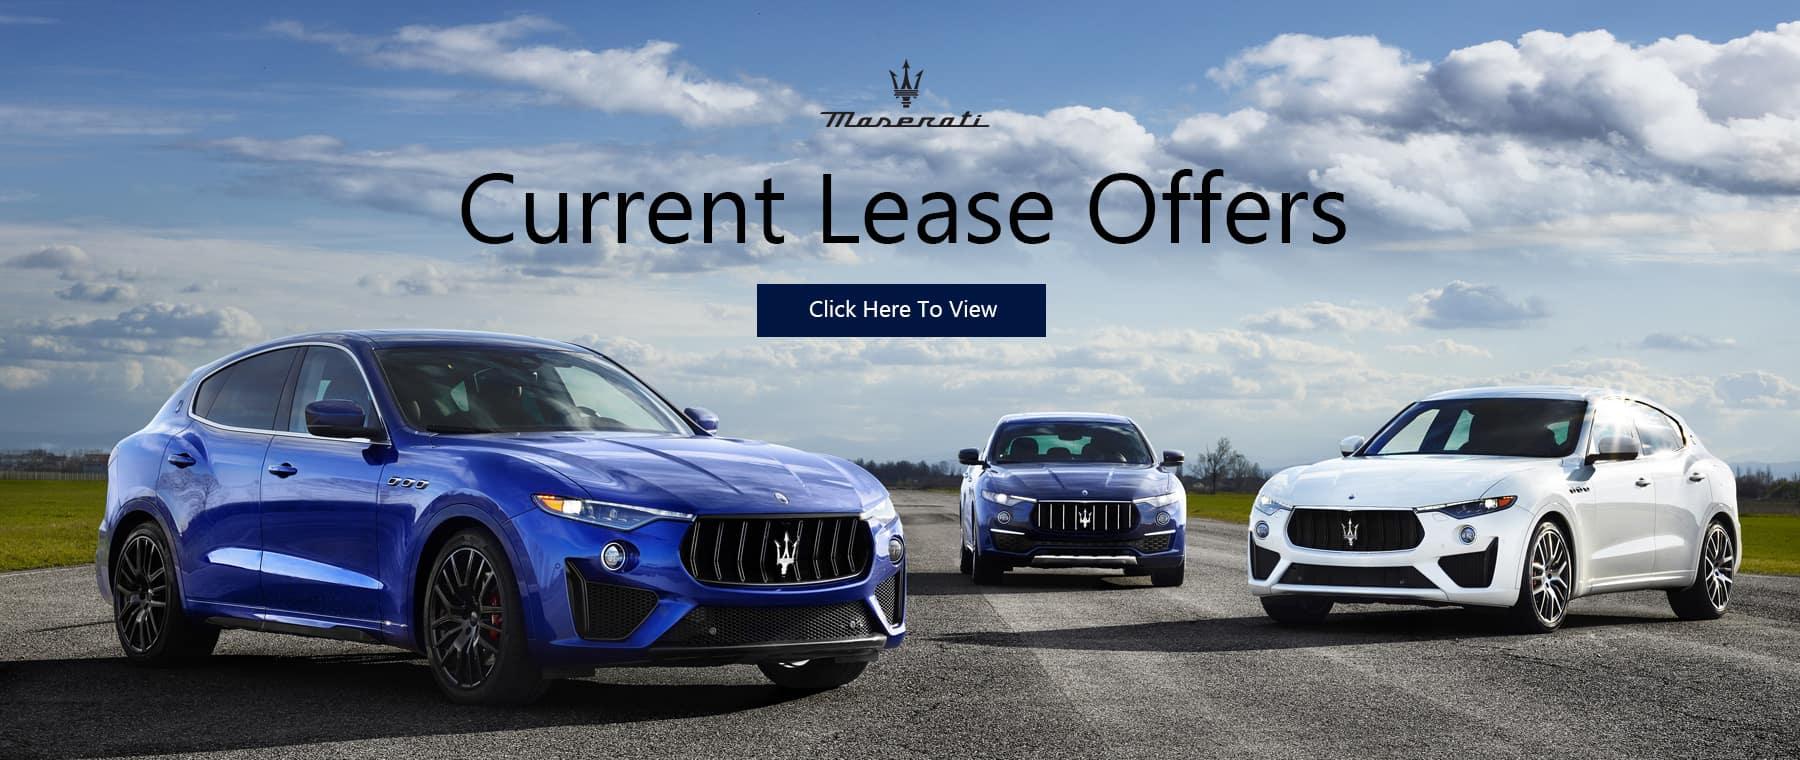 Slide_Maserati_Multiple_Lease_Offers_2